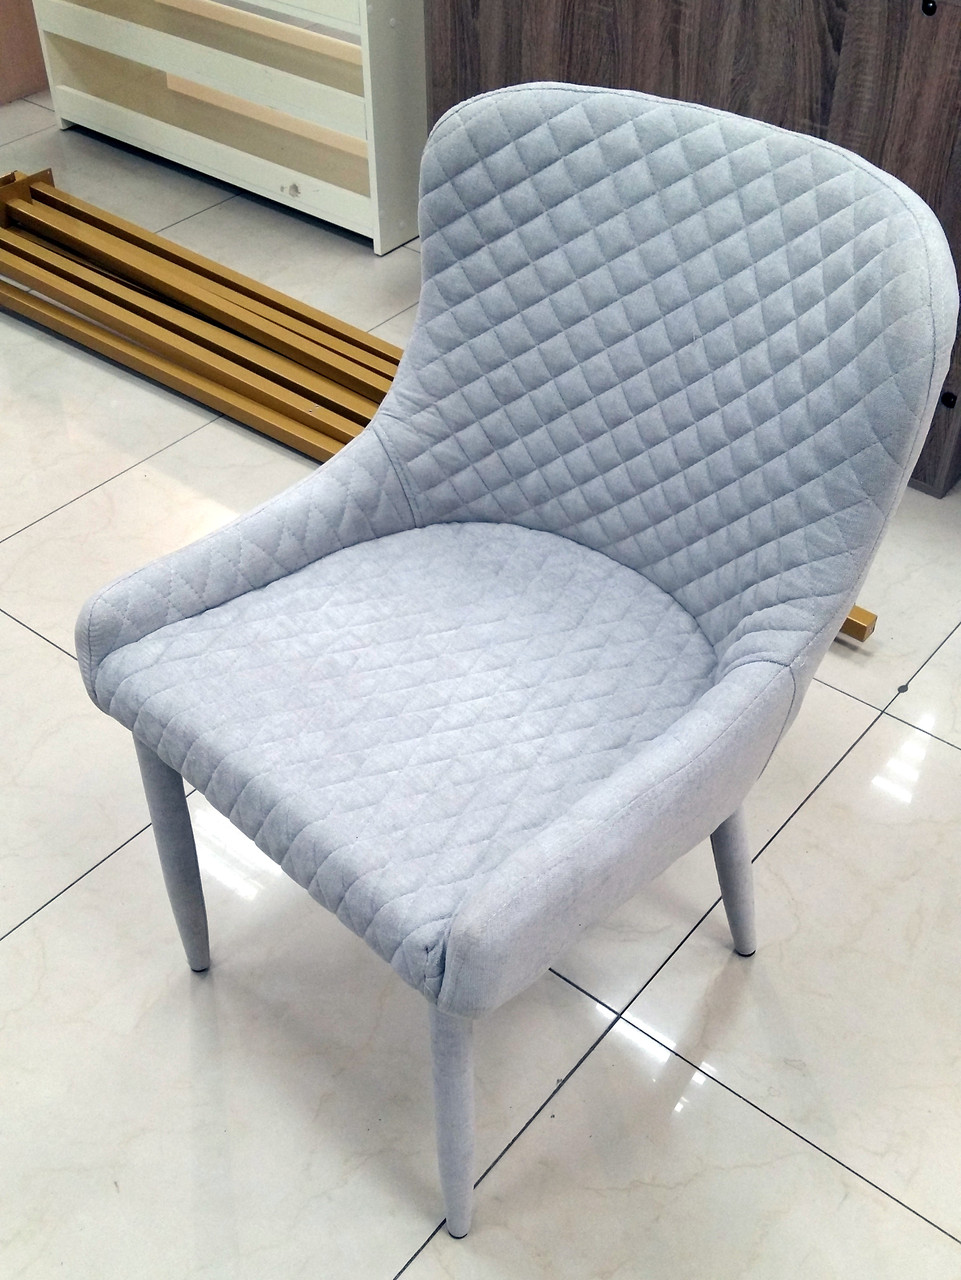 Кресло Tennessee (Теннесси) MC - 15 Евродом, цвет серый